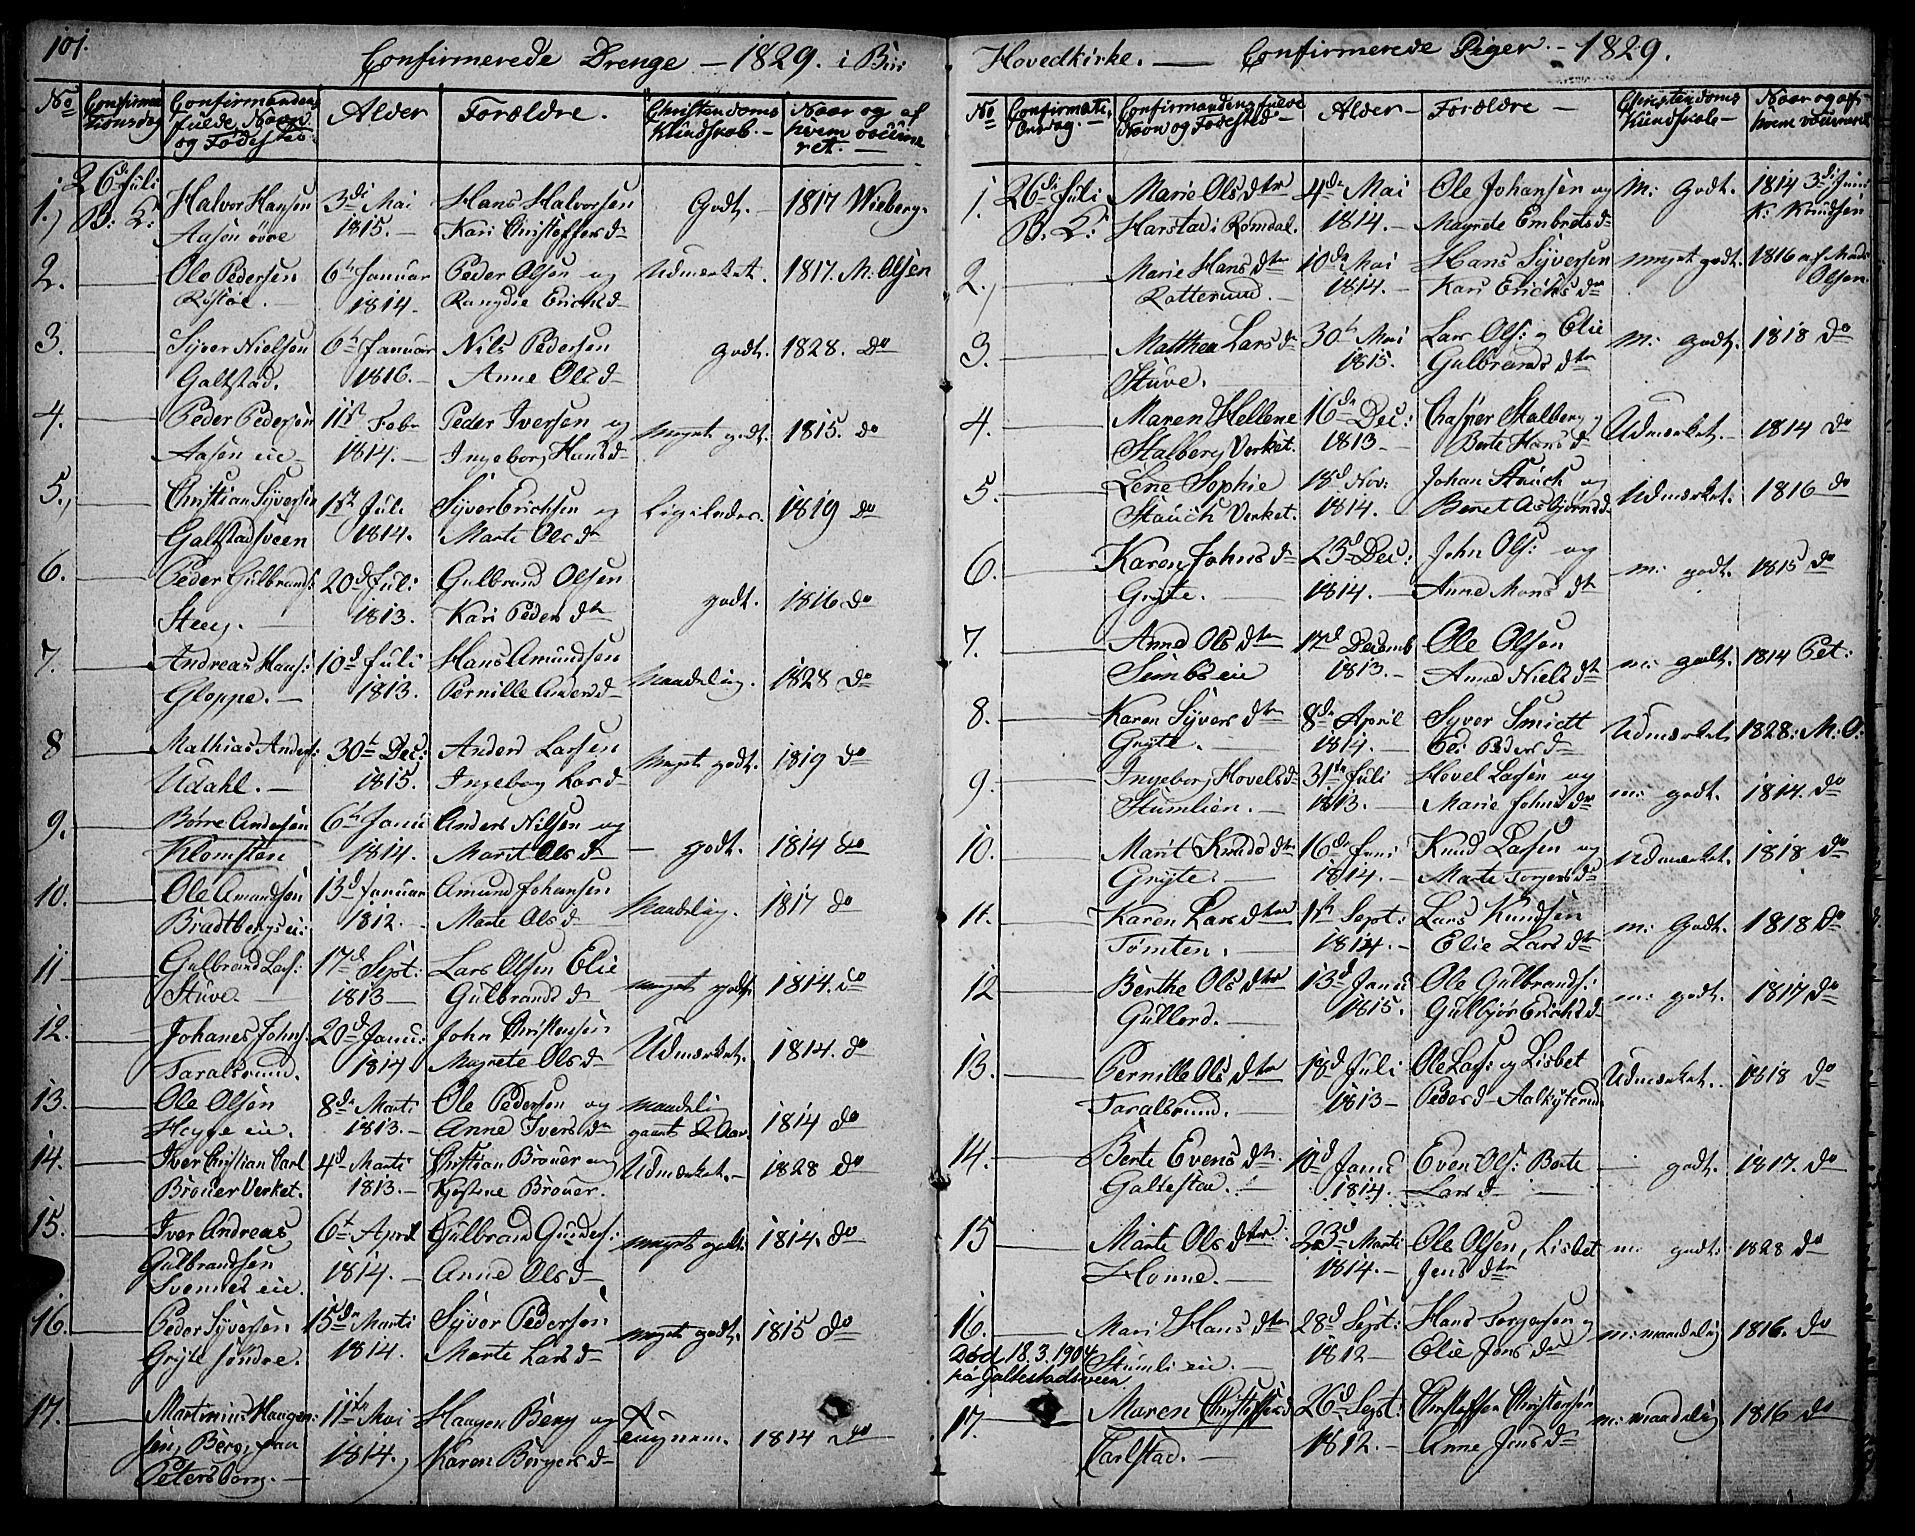 SAH, Biri prestekontor, Ministerialbok nr. 4, 1829-1842, s. 101